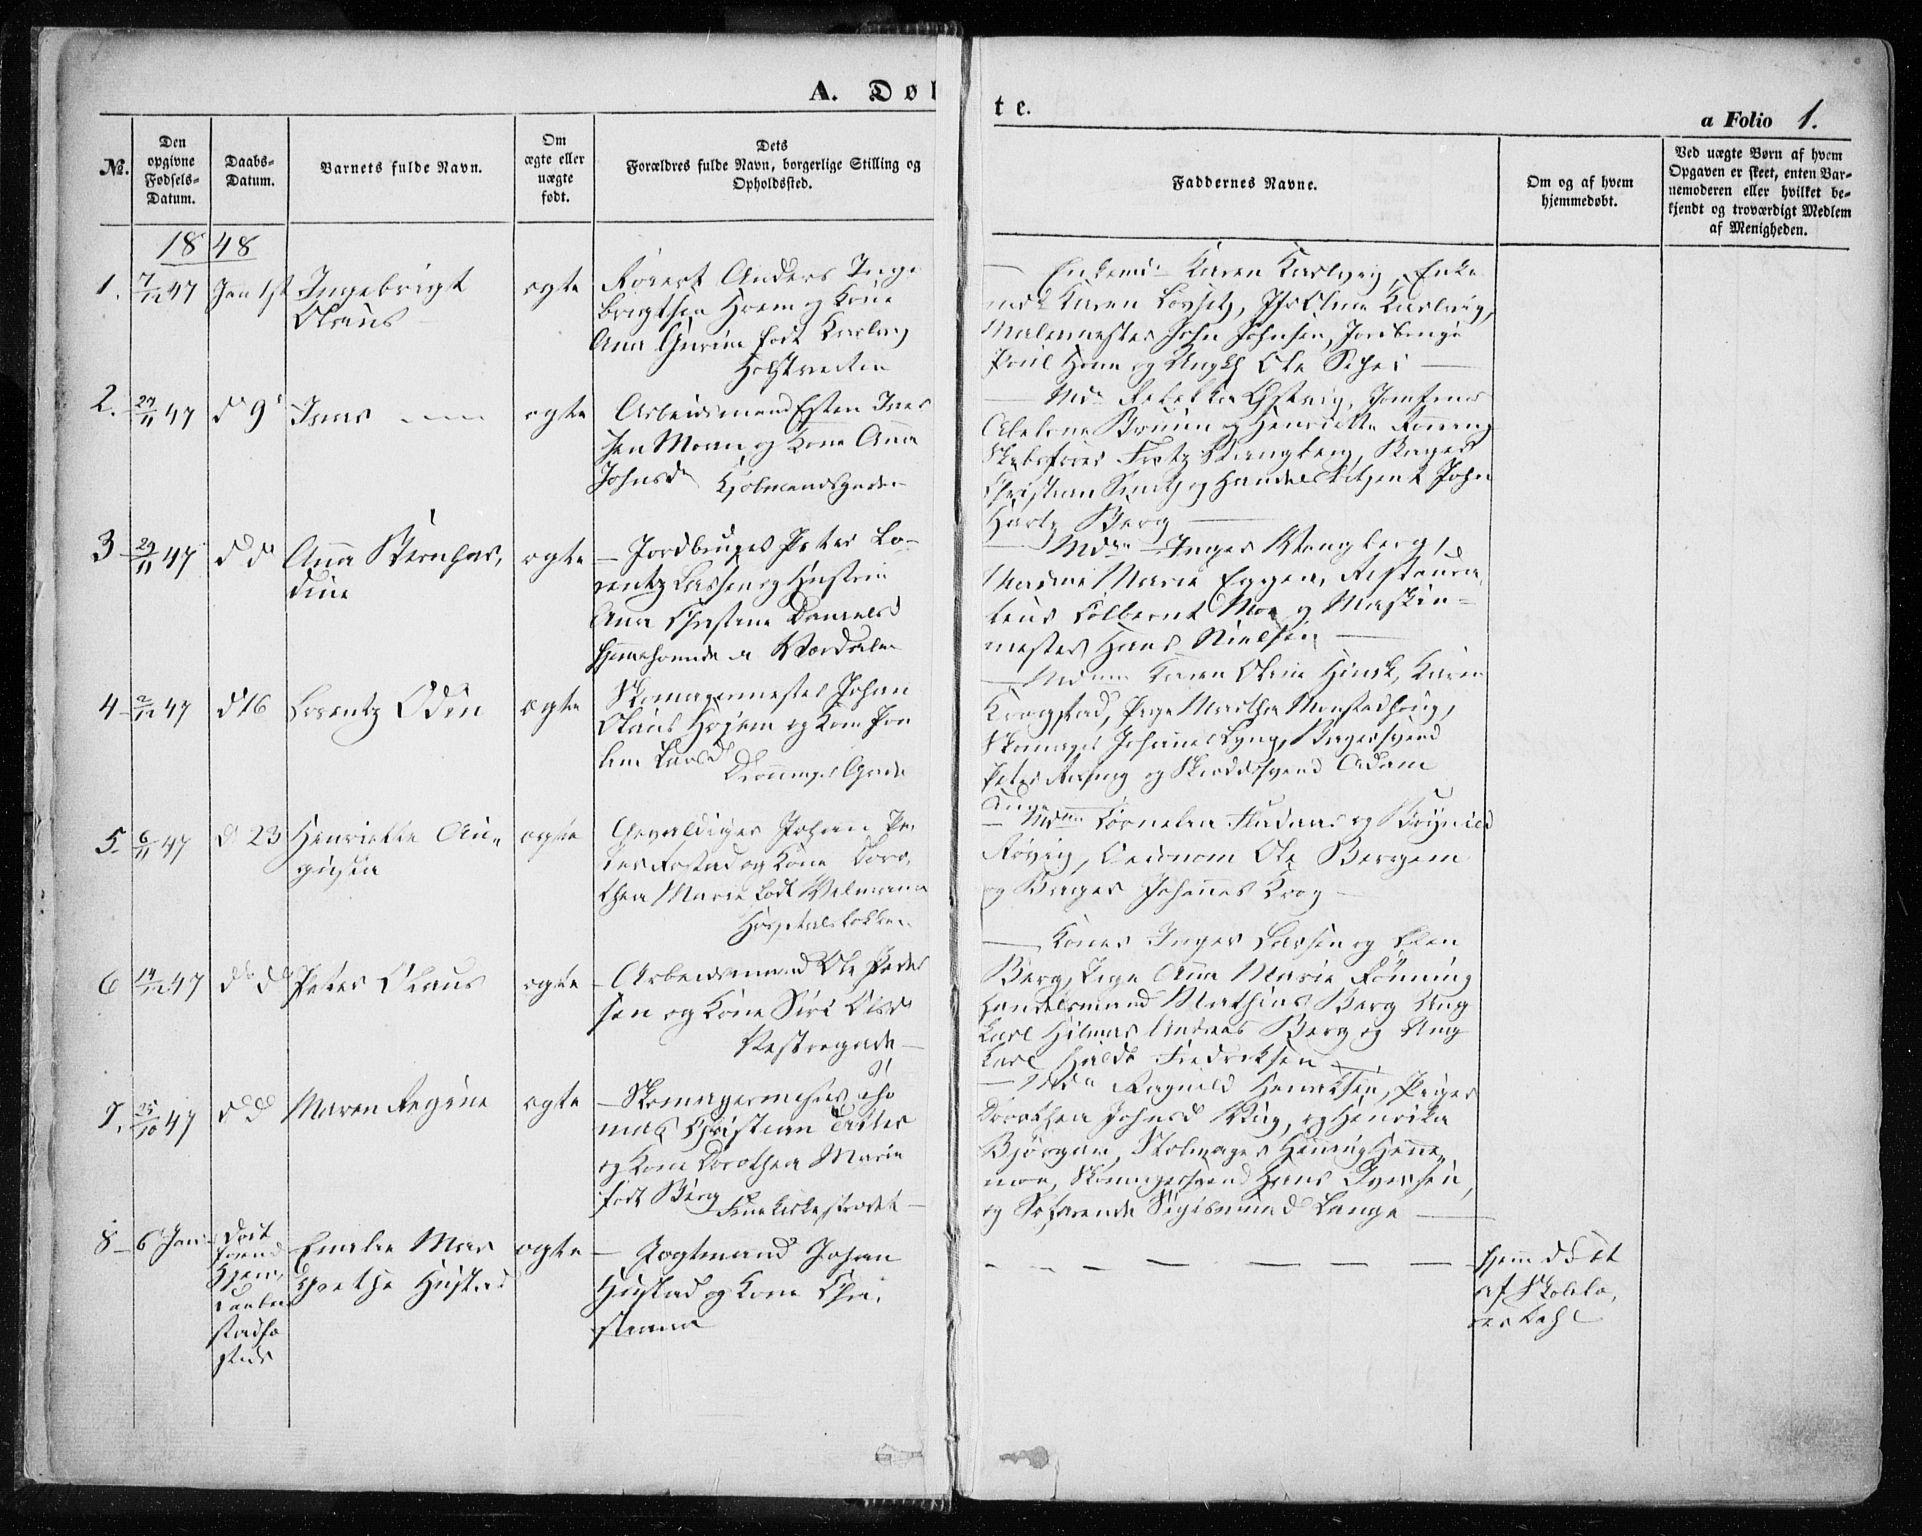 SAT, Ministerialprotokoller, klokkerbøker og fødselsregistre - Sør-Trøndelag, 601/L0051: Parish register (official) no. 601A19, 1848-1857, p. 1